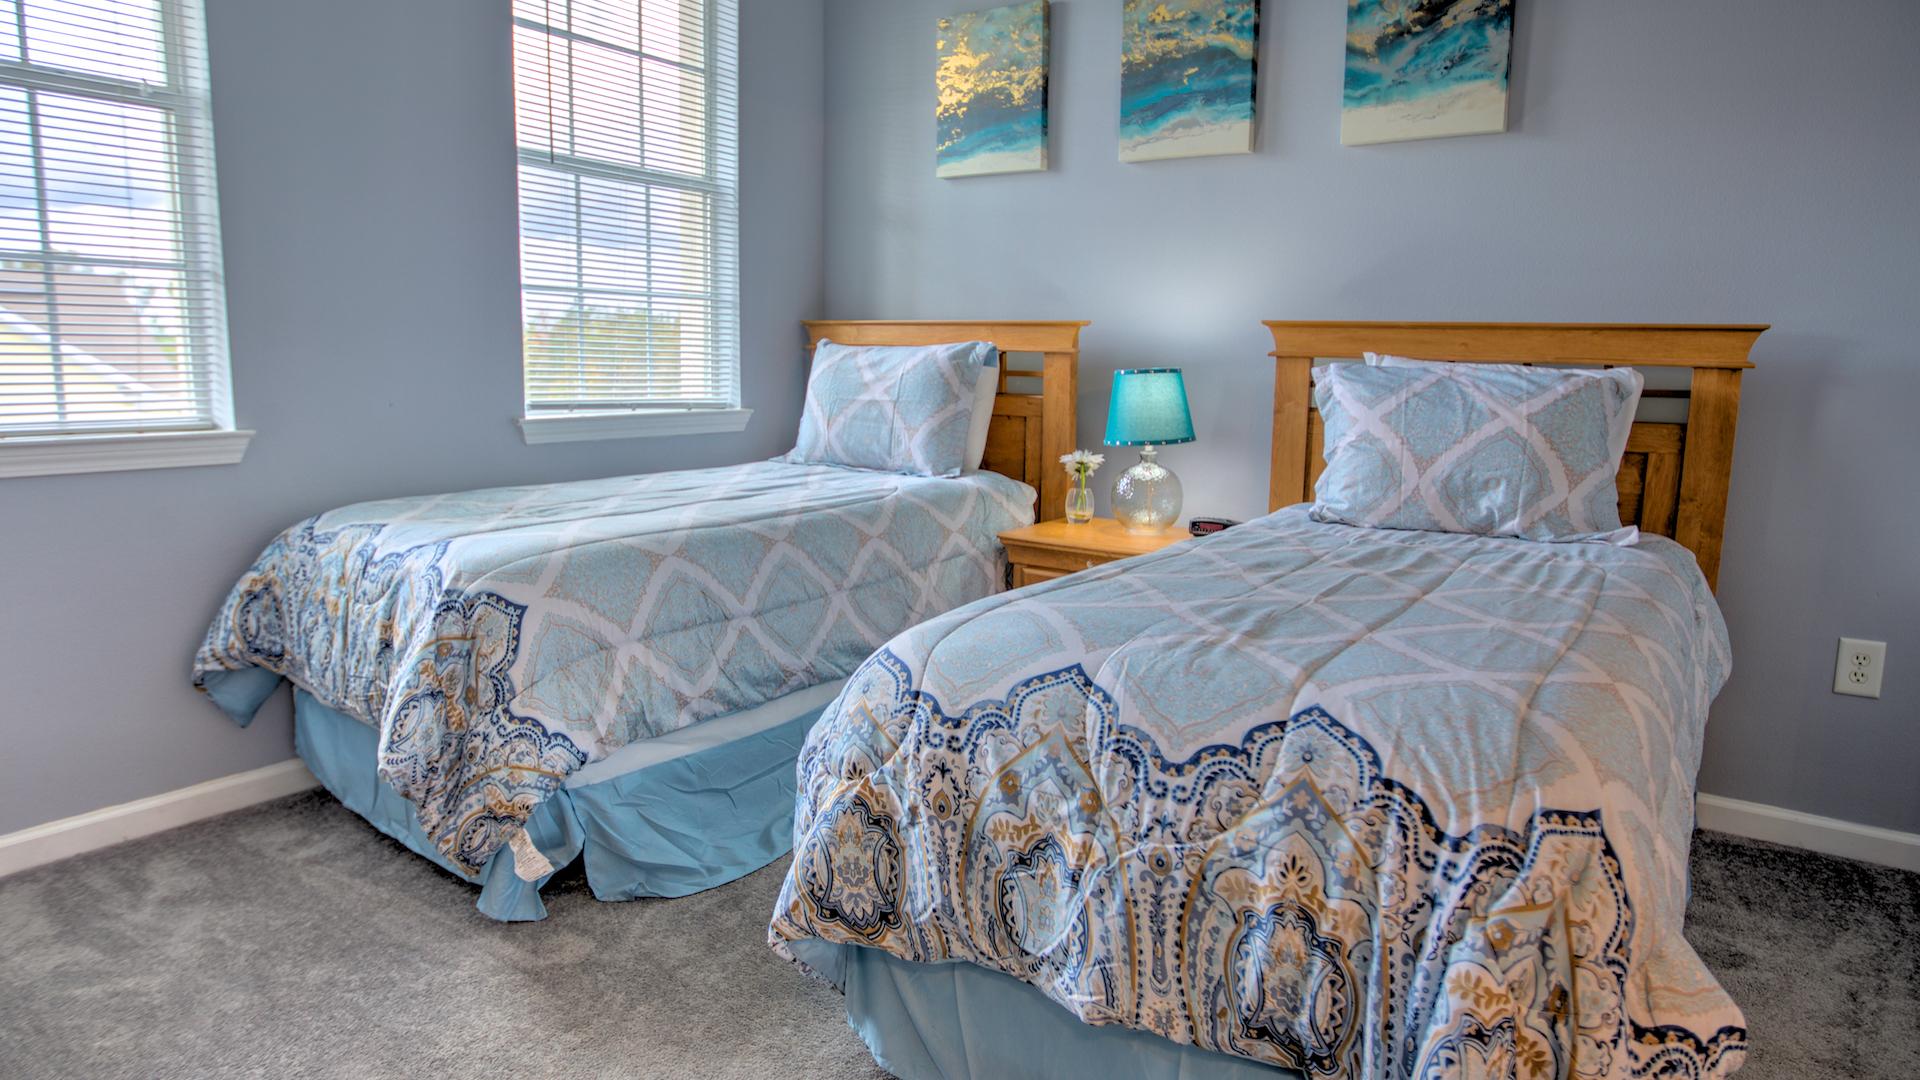 Apartment Cayman Condo at Cane Island Resort photo 20413947